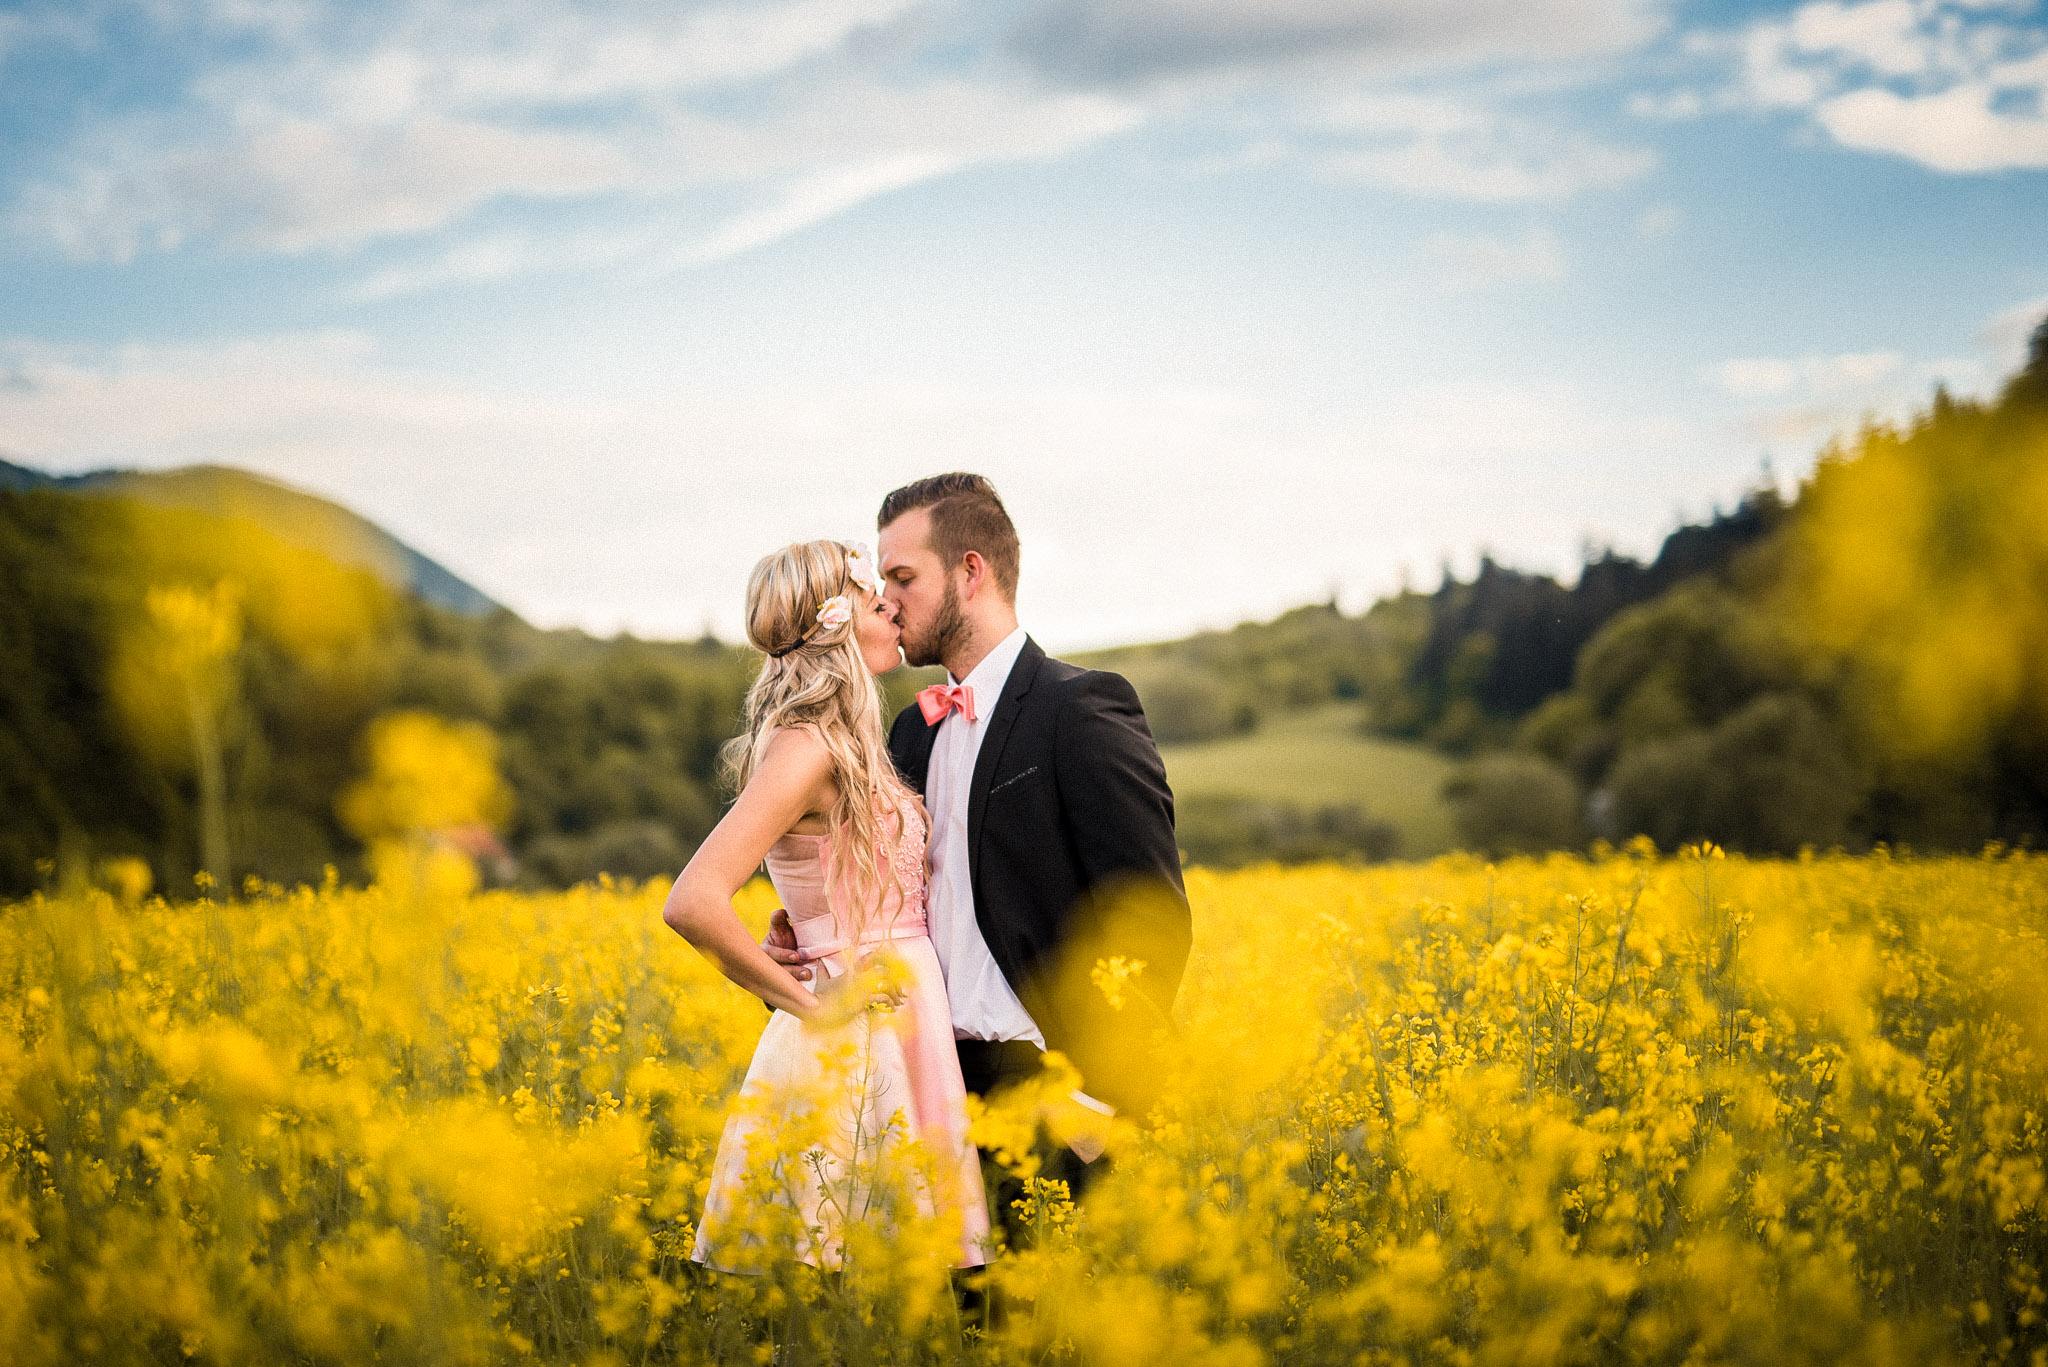 pár, láska, repka olejná, žlté kvety, pole, bozk